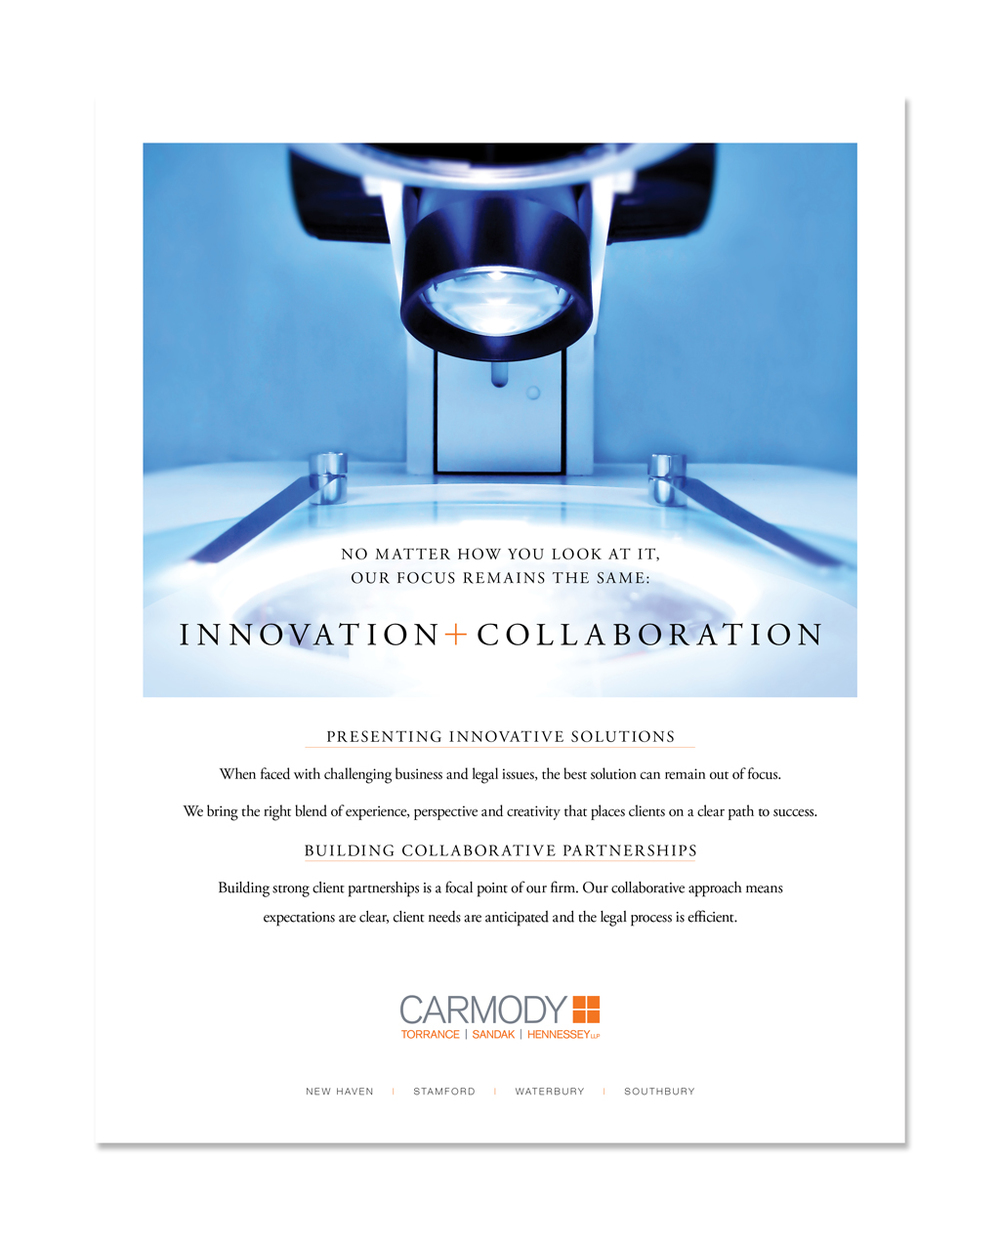 INNOVATION + COLLAORATION   Print Ad: Carmody Torrance Sandak & Hennessey LLP